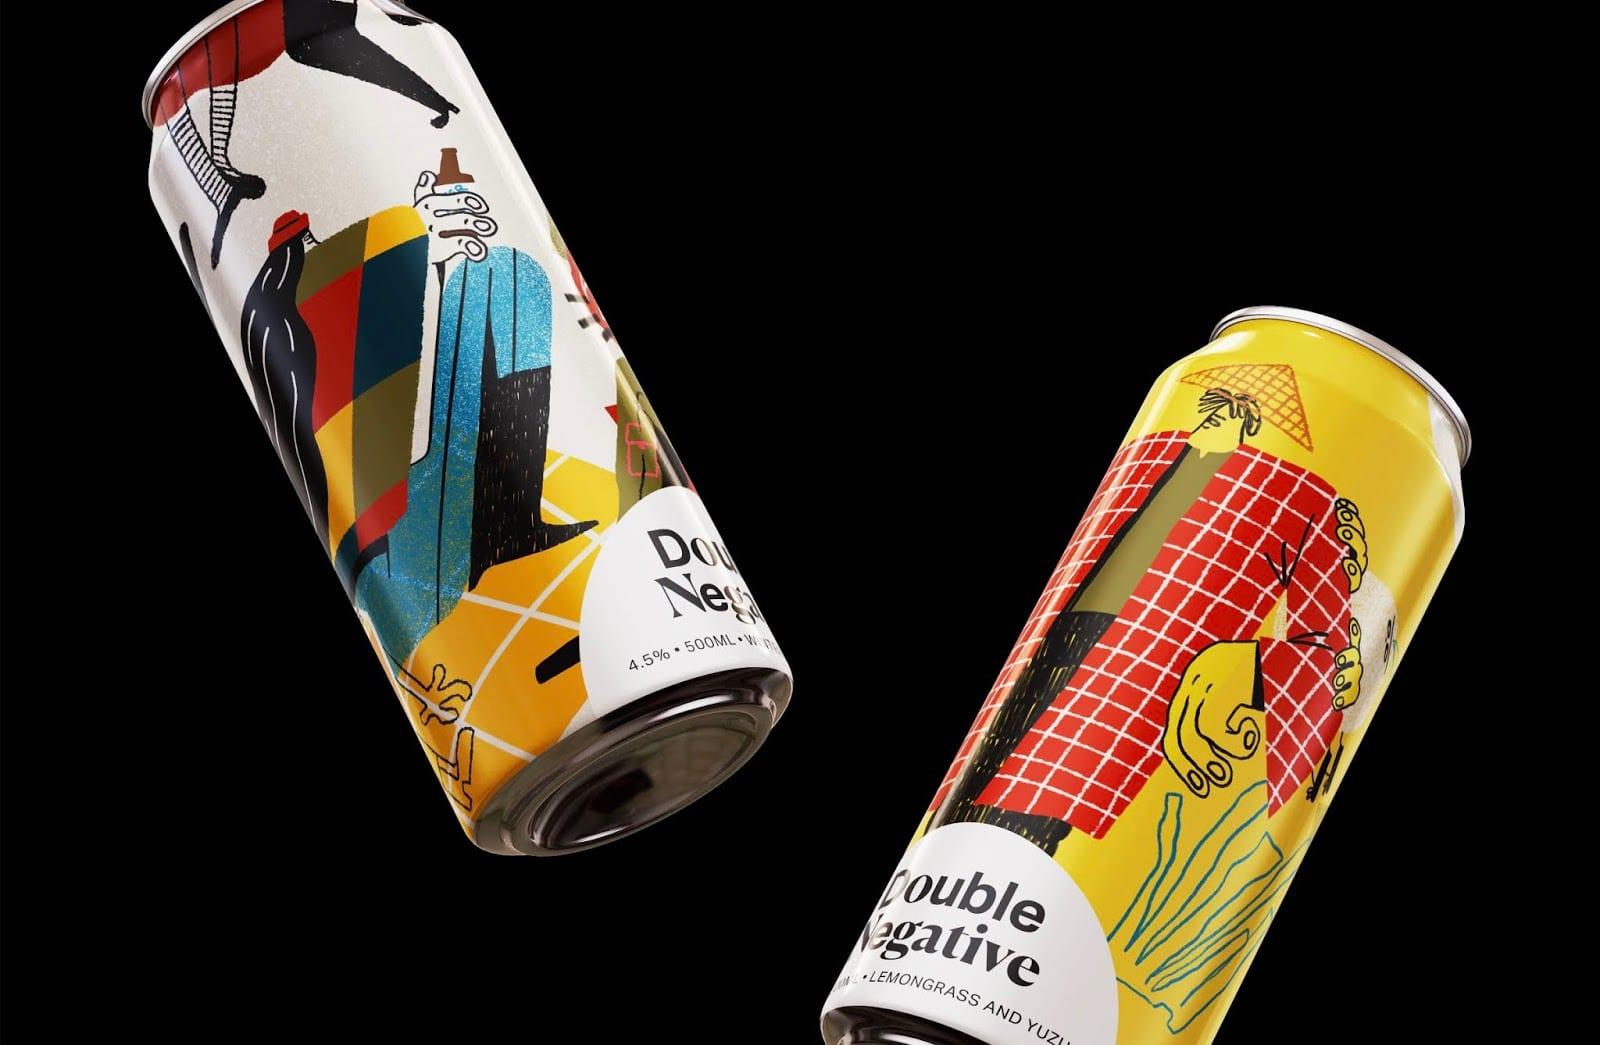 ach tie obaly – double negative artisanal brewery 1 - Ach, tie obaly – Double Negative Artisanal Brewery